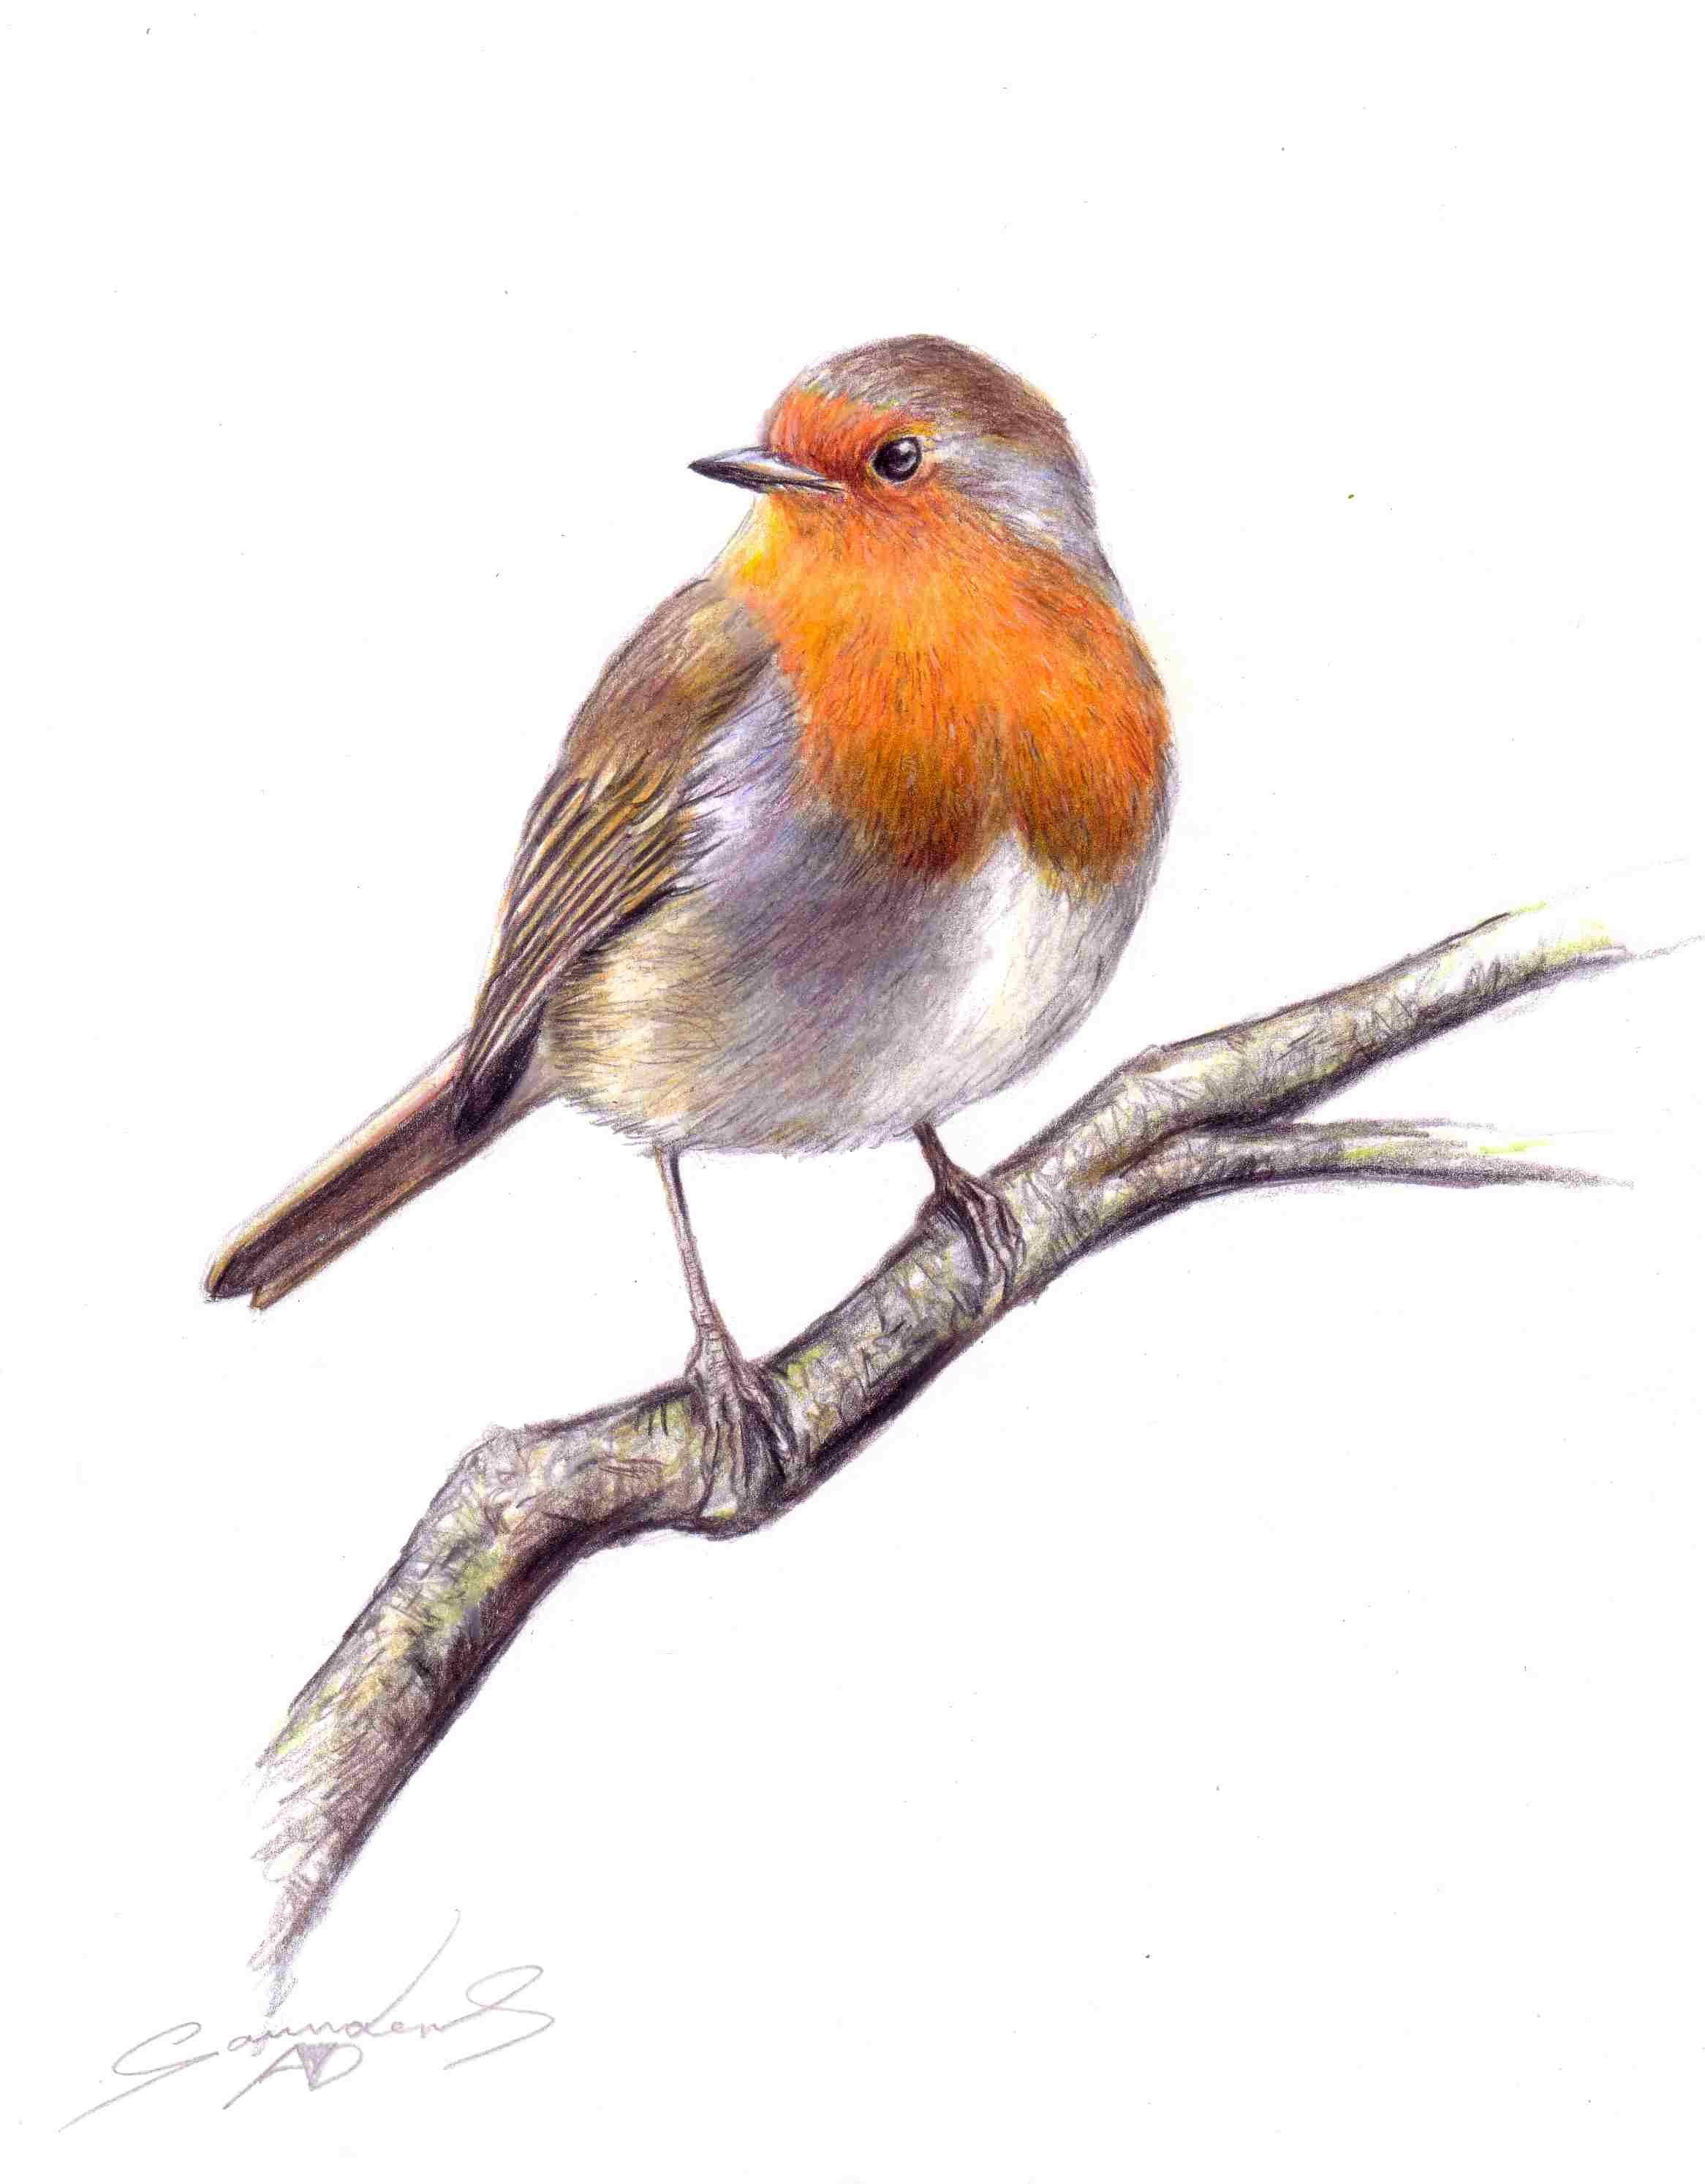 Drawn robin robin bird YouTube Time bird bird Drawing